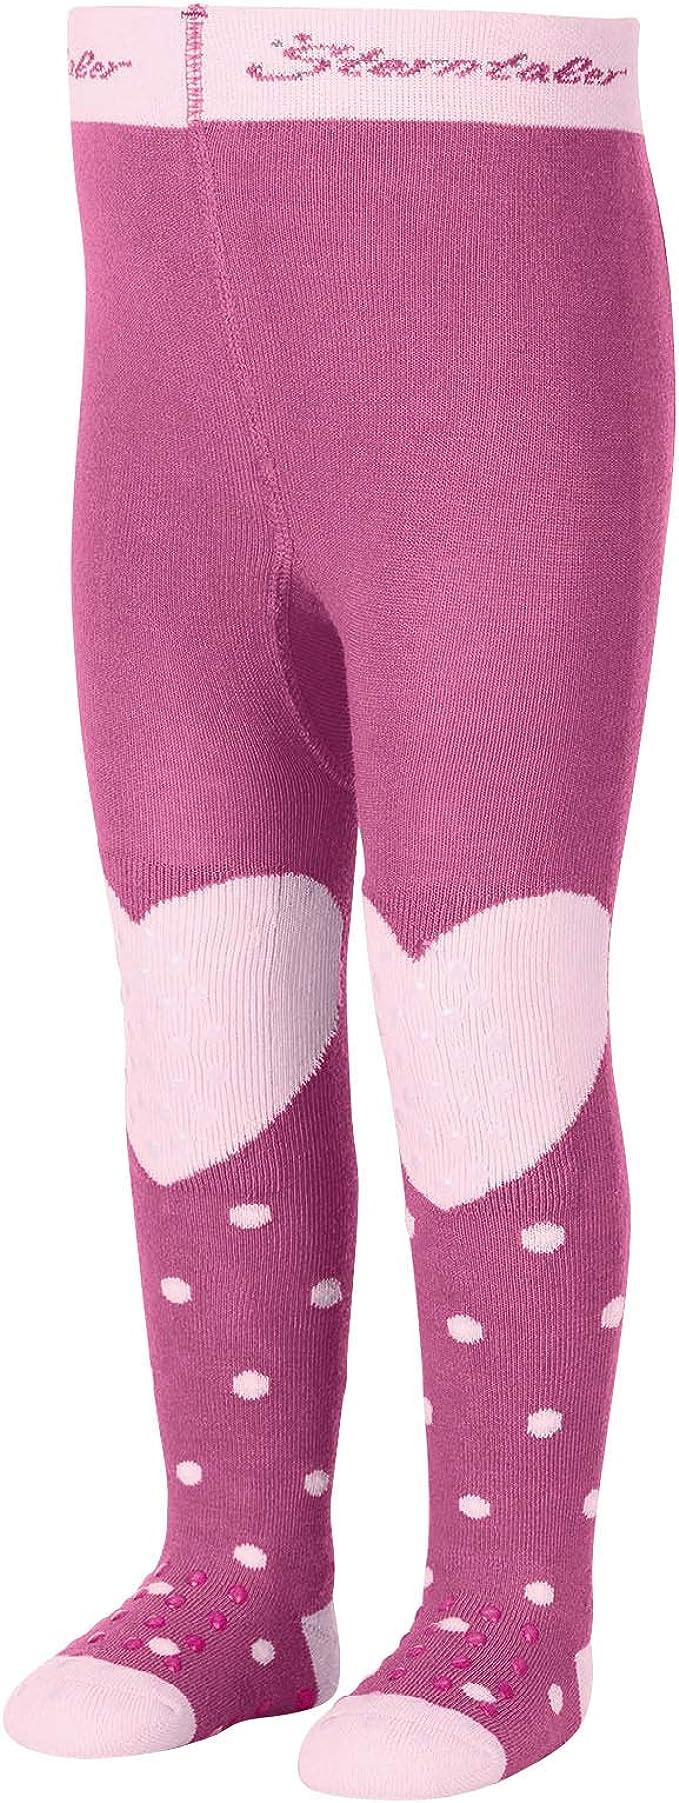 Sterntaler Baby Boys Krabbelstrumpfhose Abschlepper Legging Tights